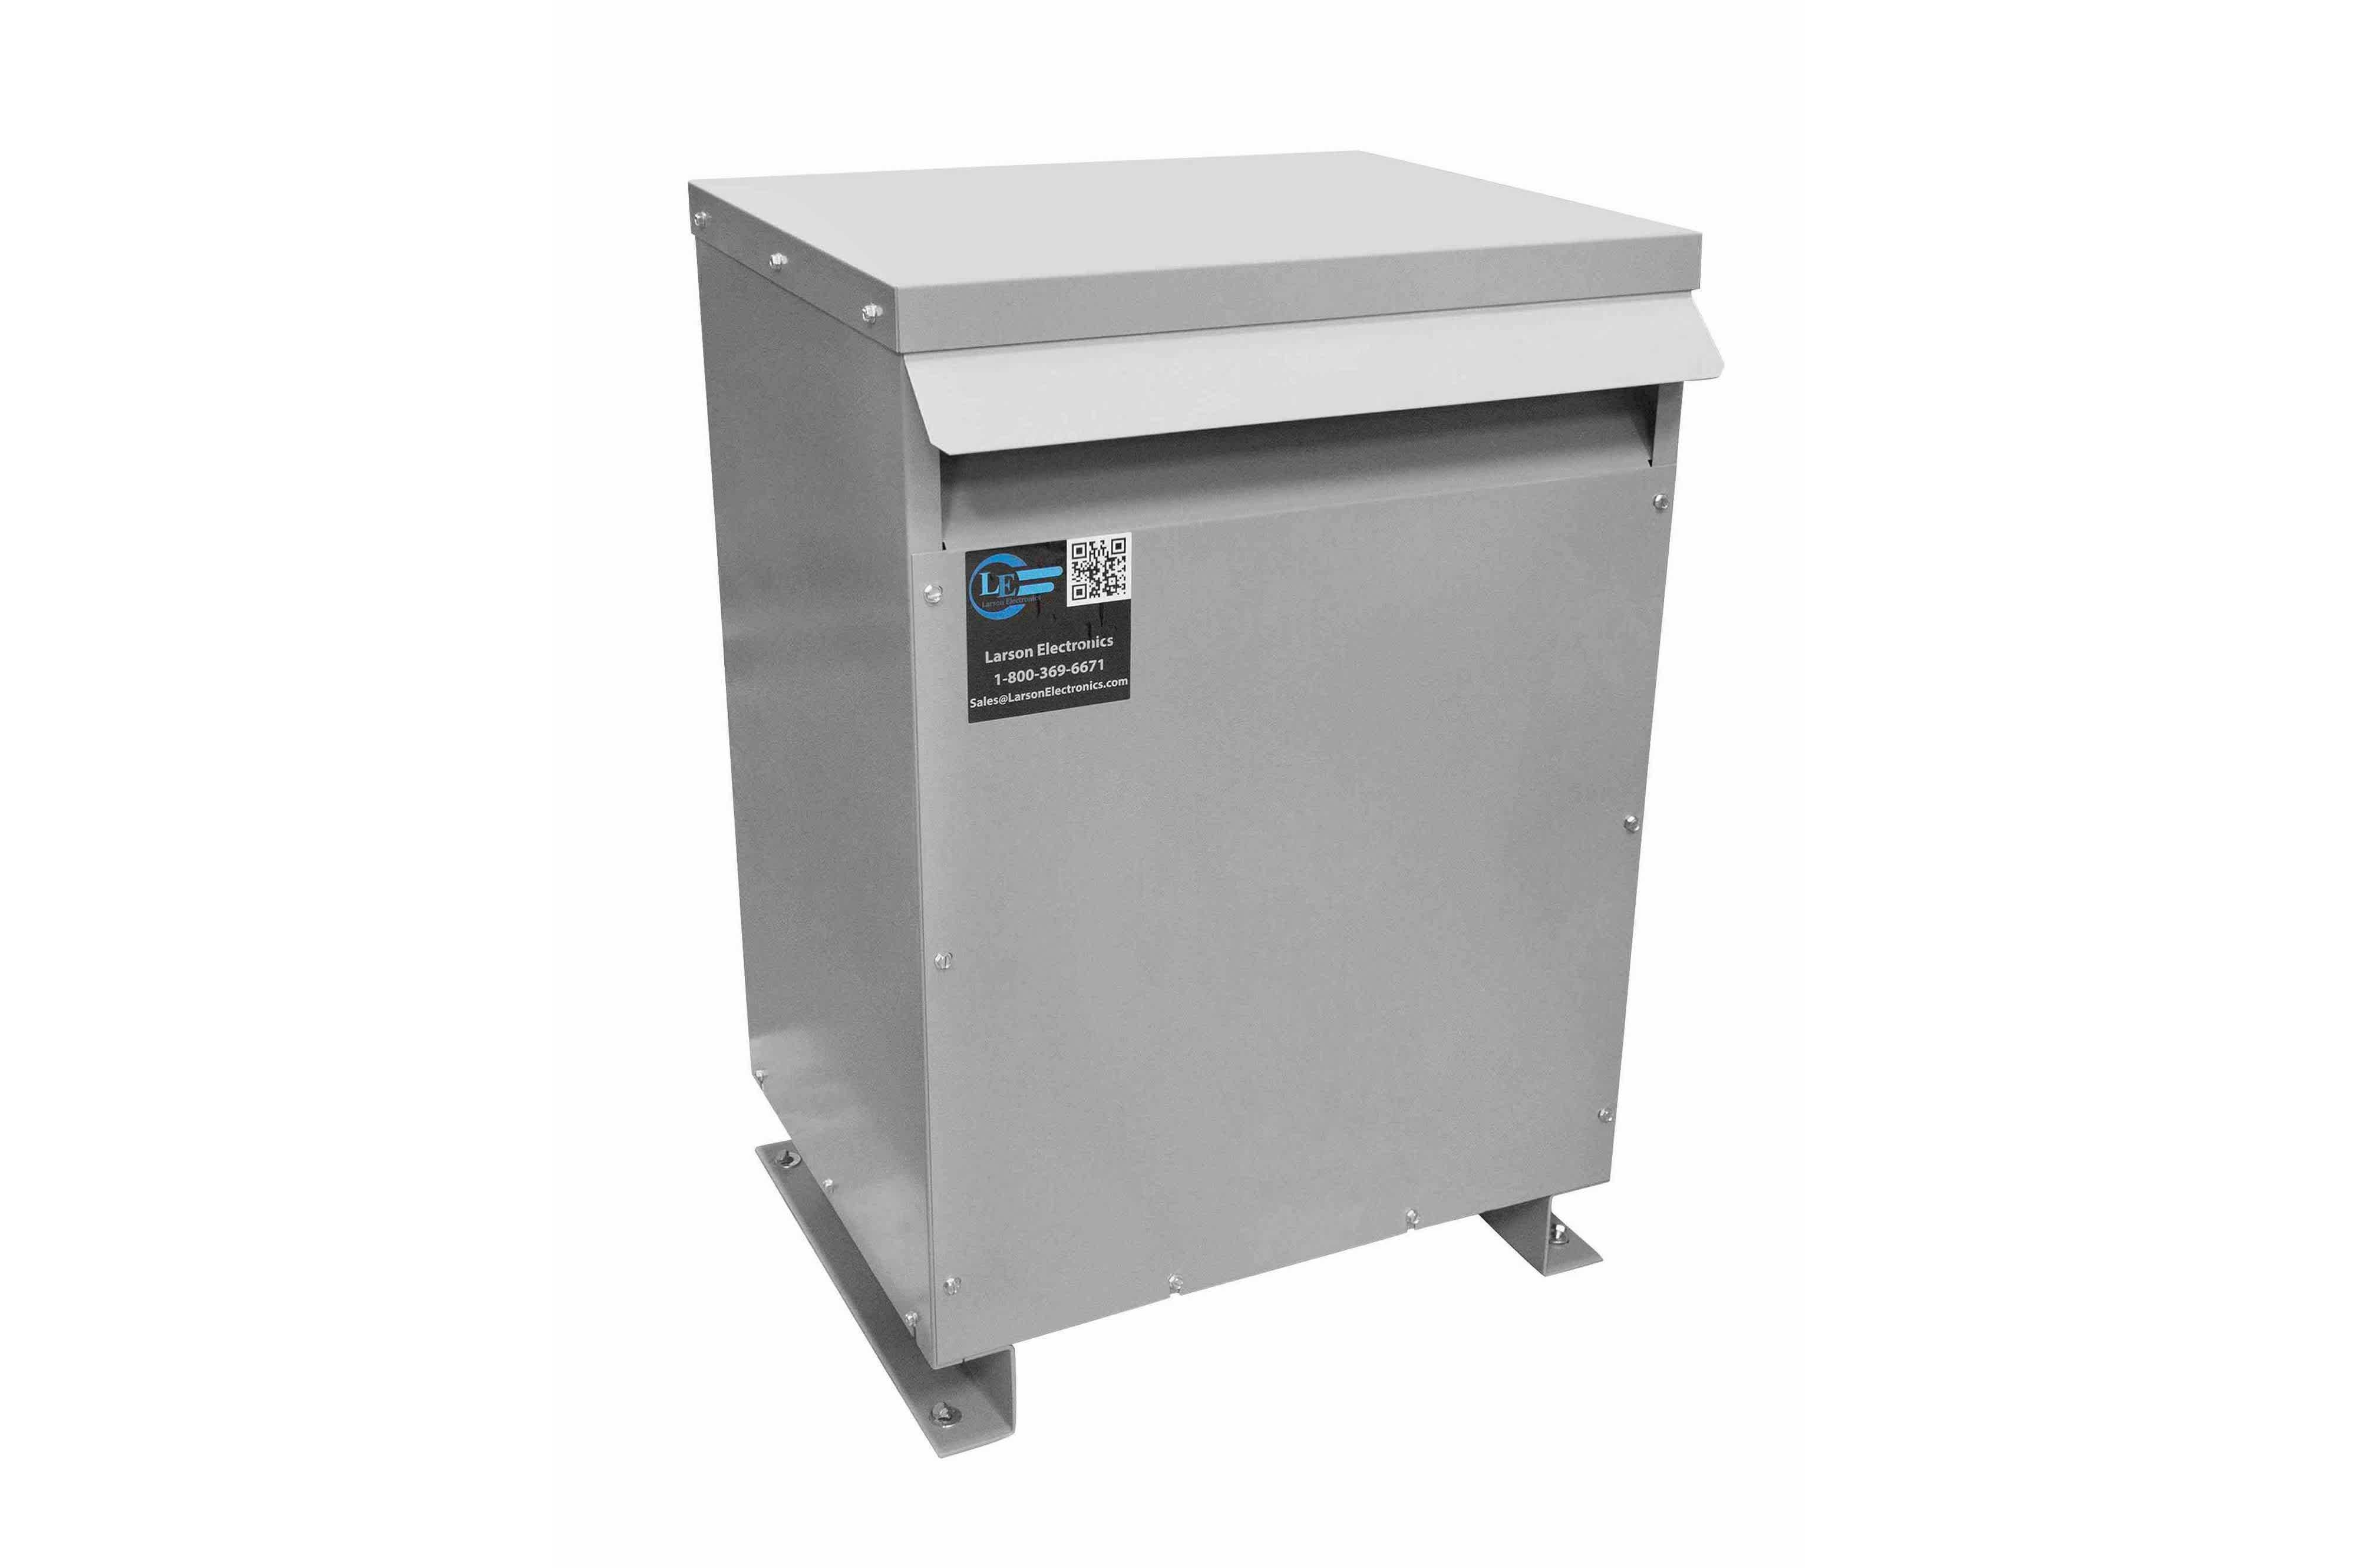 700 kVA 3PH Isolation Transformer, 480V Wye Primary, 575V Delta Secondary, N3R, Ventilated, 60 Hz